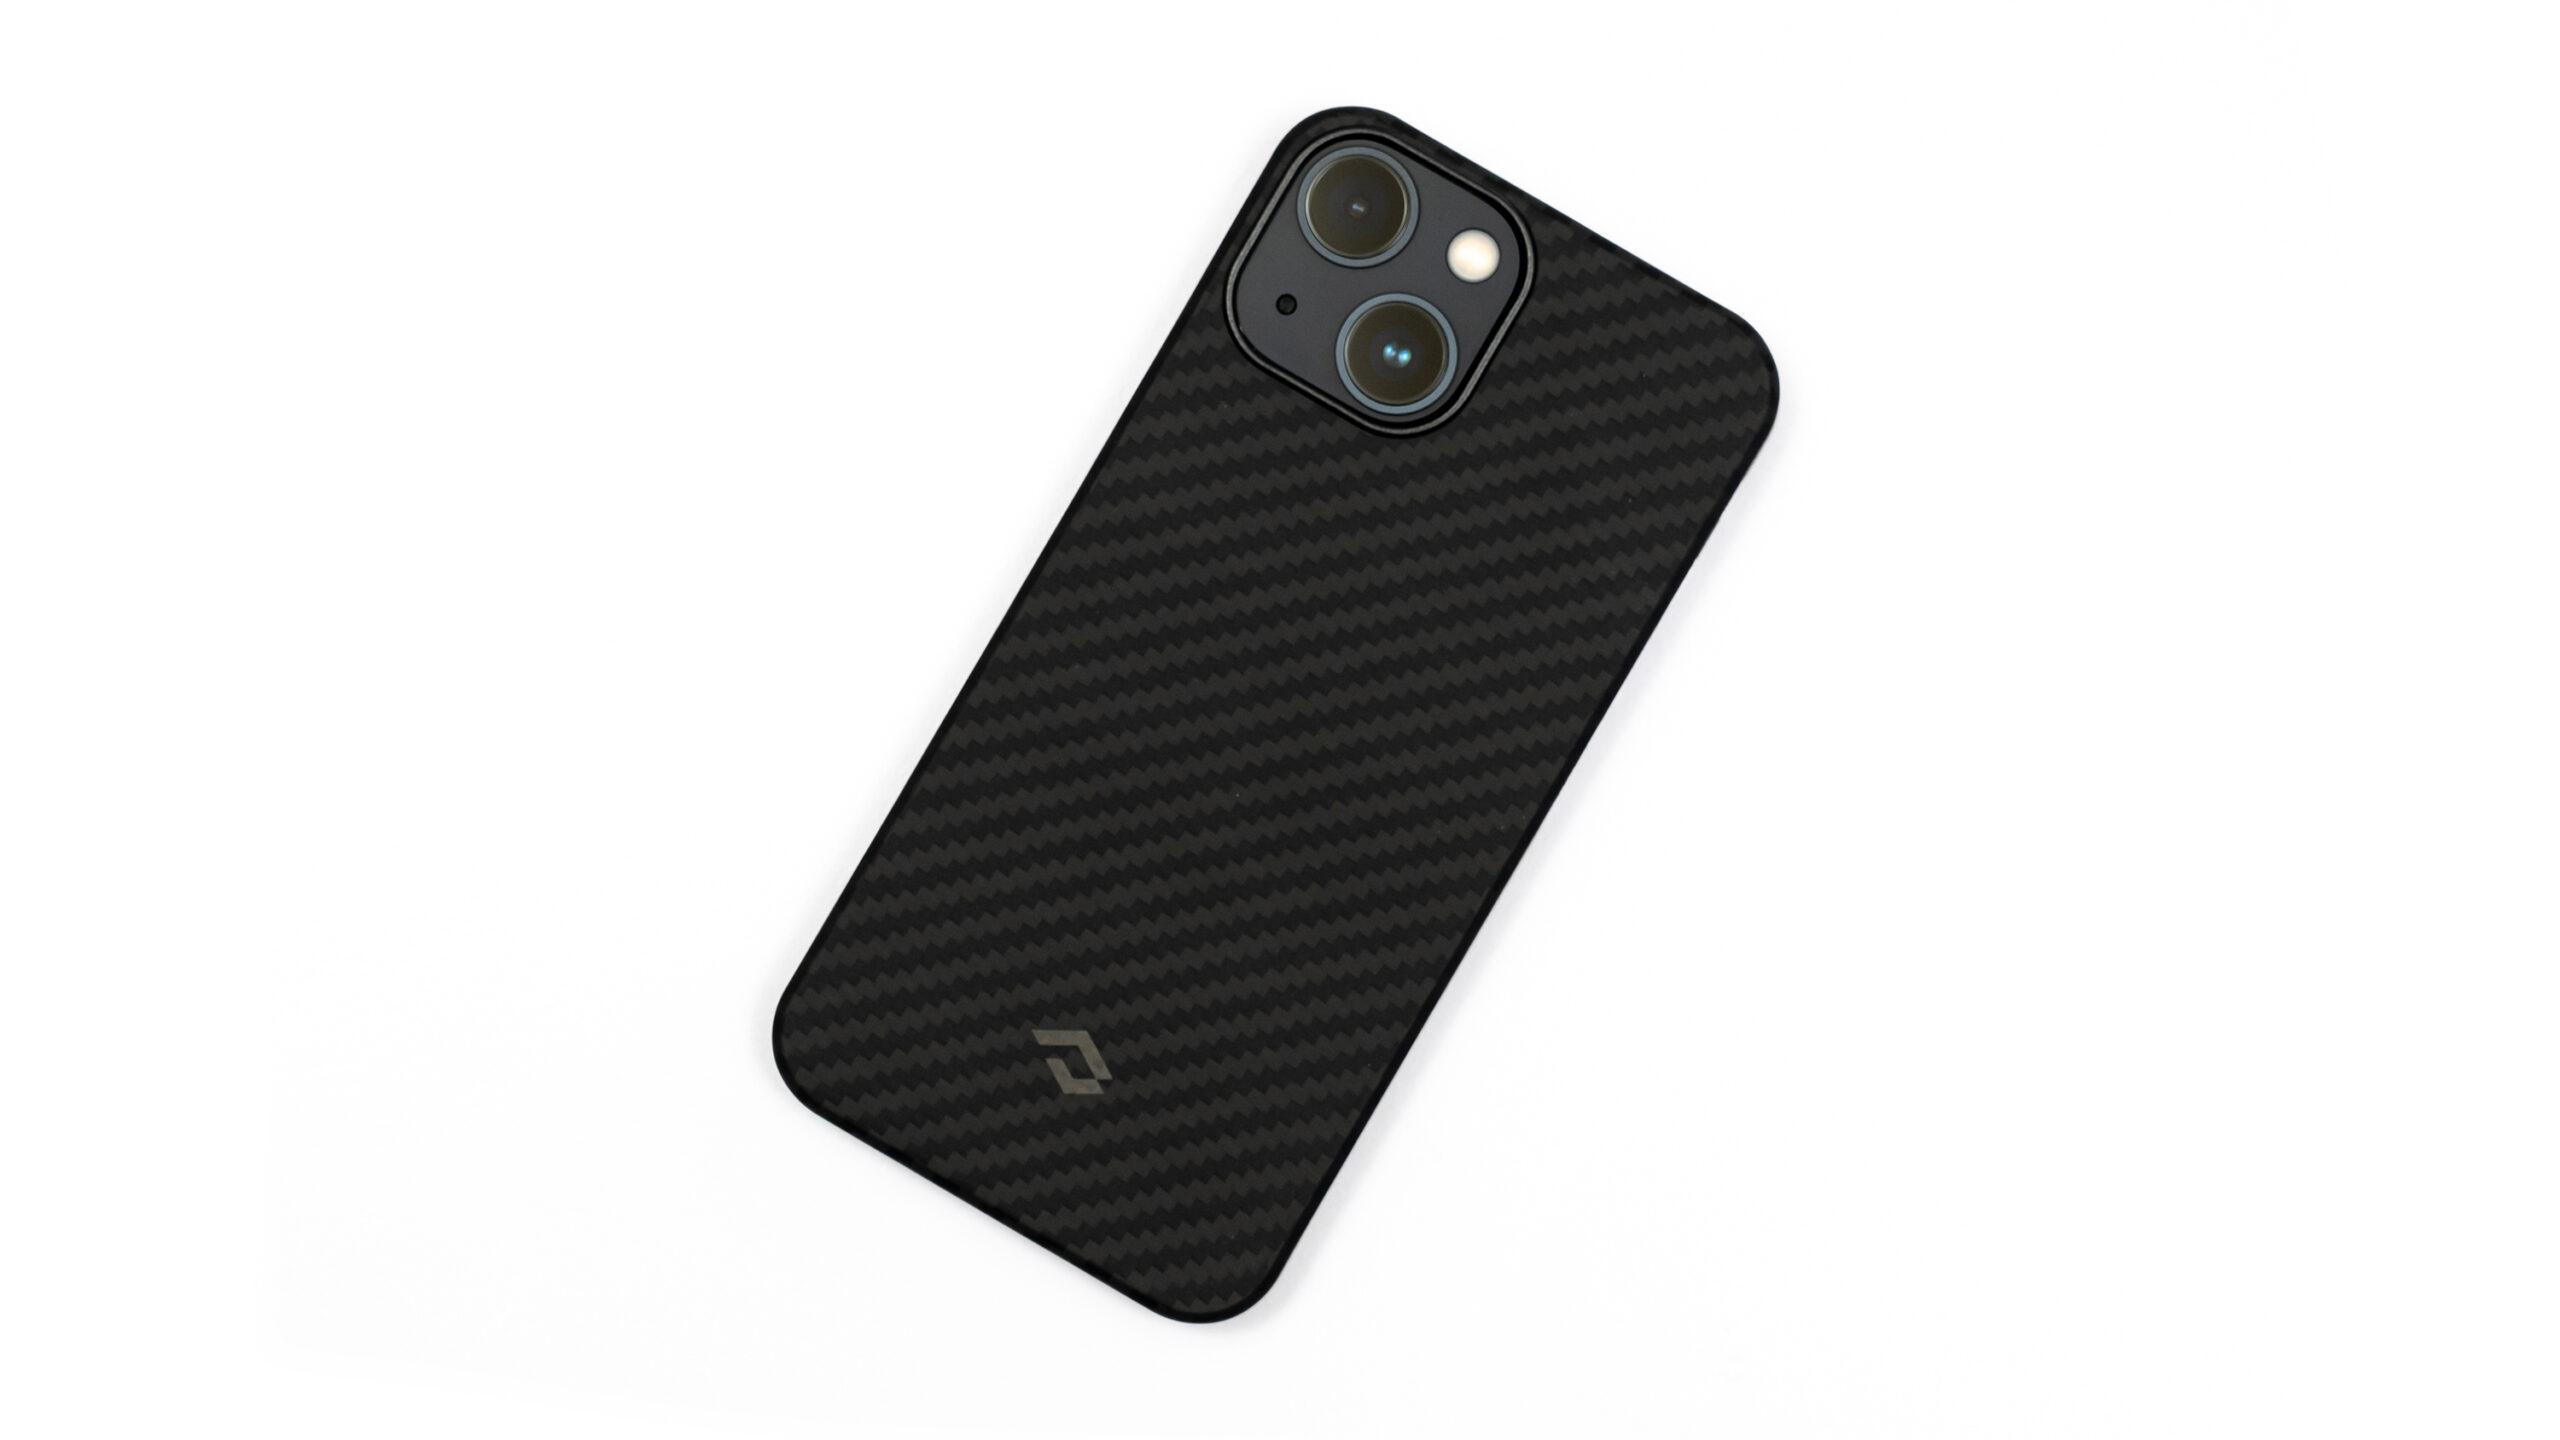 MagSafe対応で超便利!PITAKAのiPhone 13 mini用MagEZ Case 2をレビュー